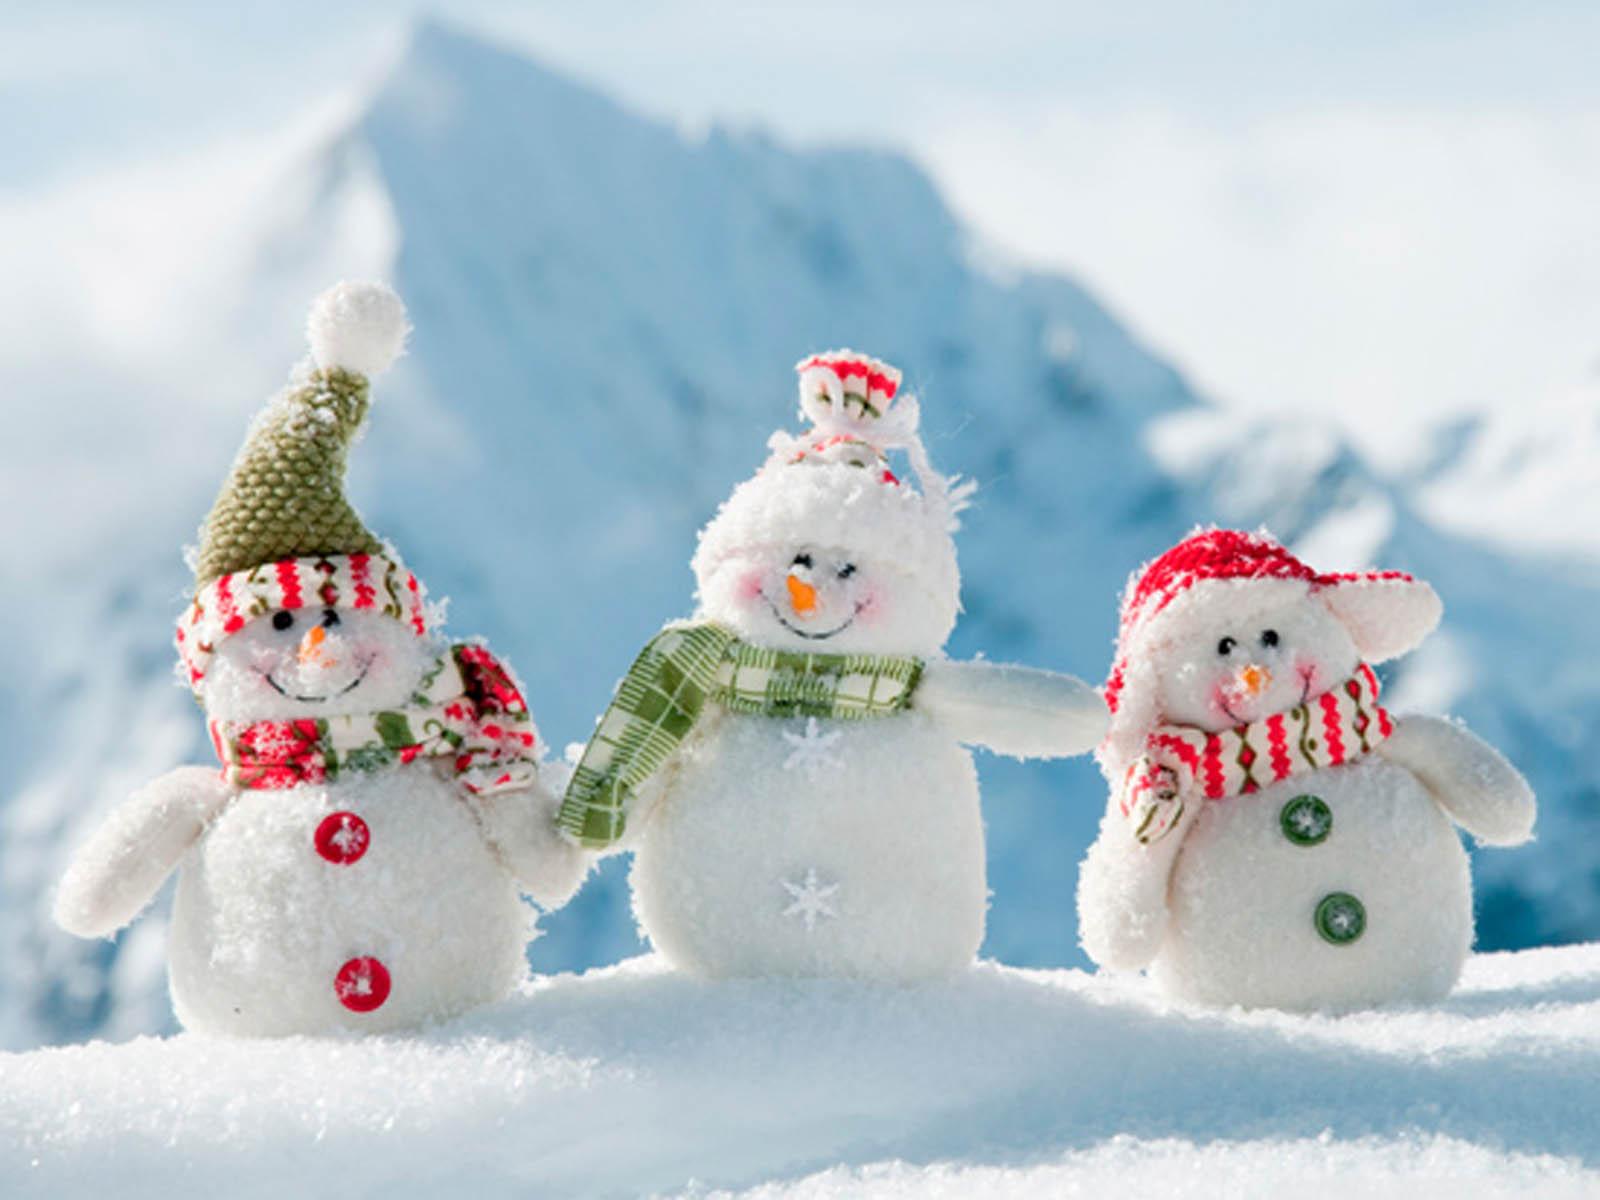 72] Snowmen Wallpapers on WallpaperSafari 1600x1200